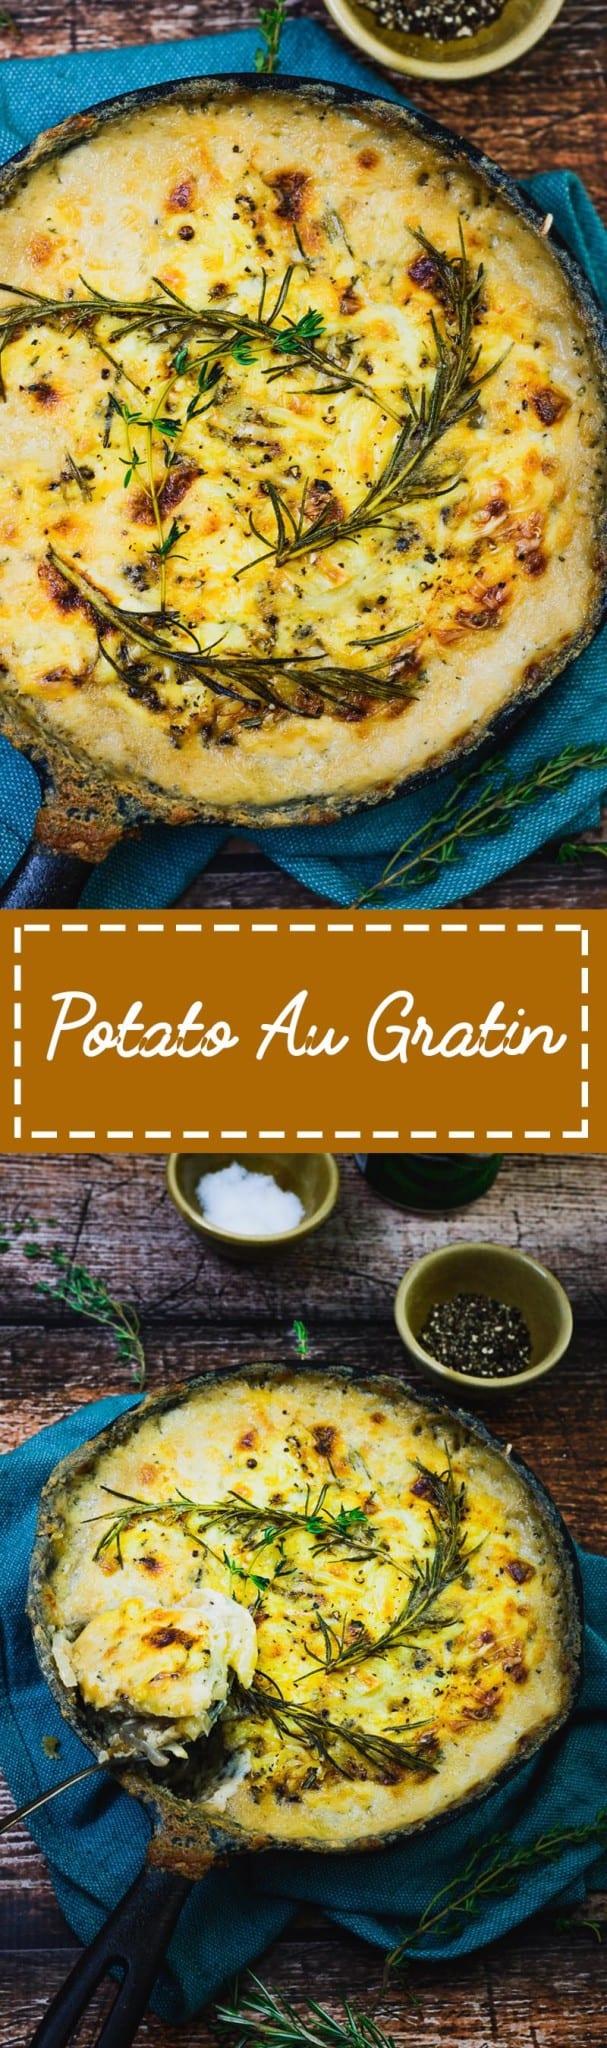 Potato Au Gratin with Caramelised Onion and Gouda Cheese 1-Potato Au Gratin with Caramelised Onion and Gouda Cheese